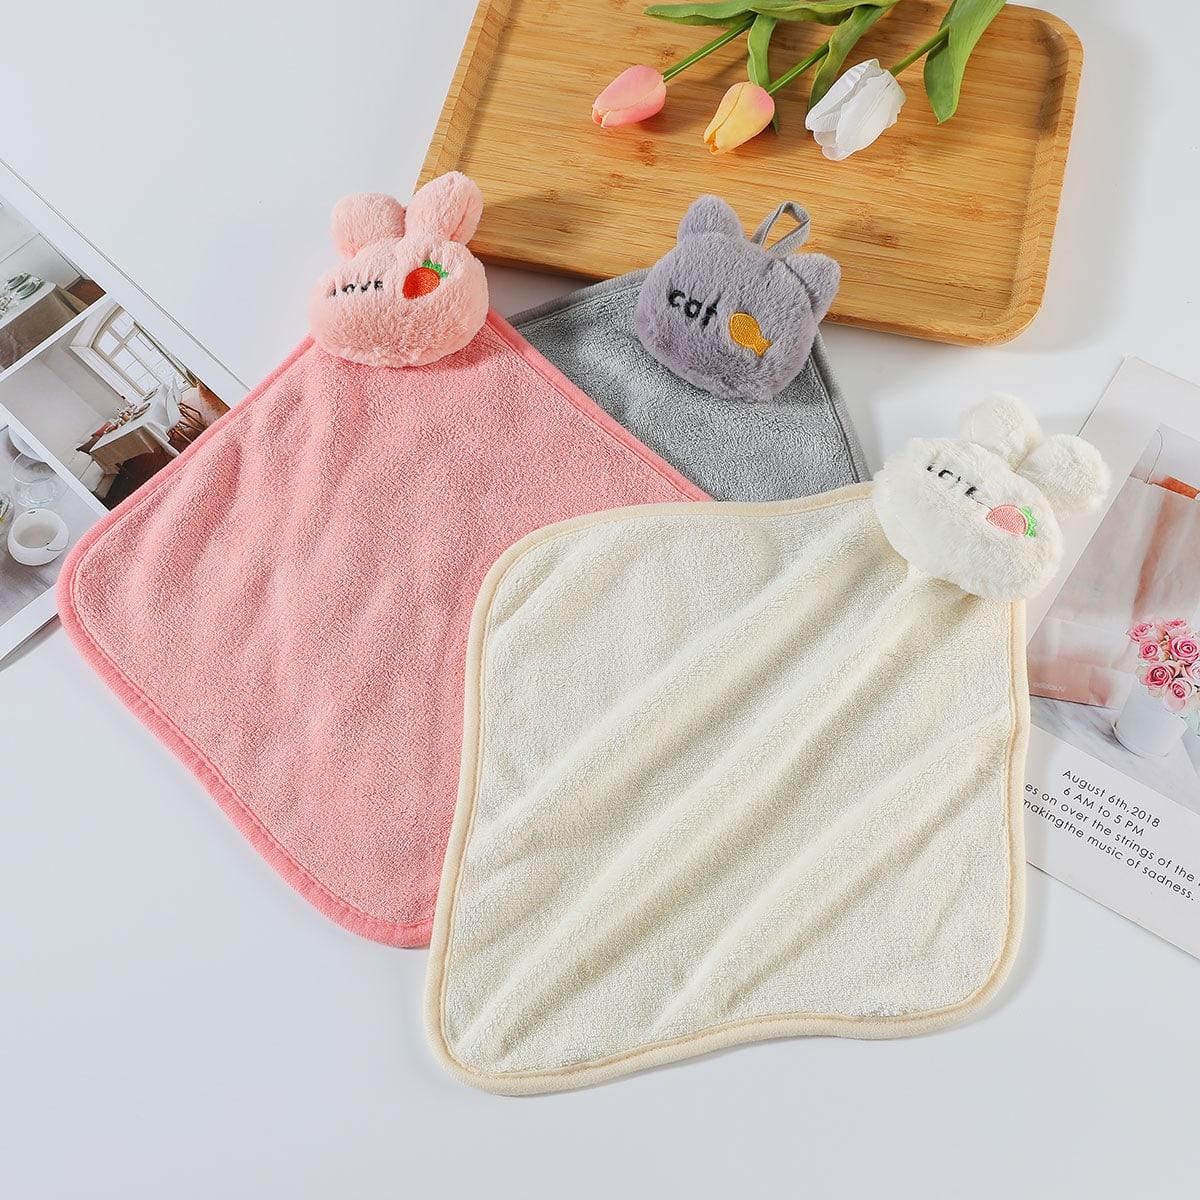 1Pc Random Embroidery Pattern Hand Towel